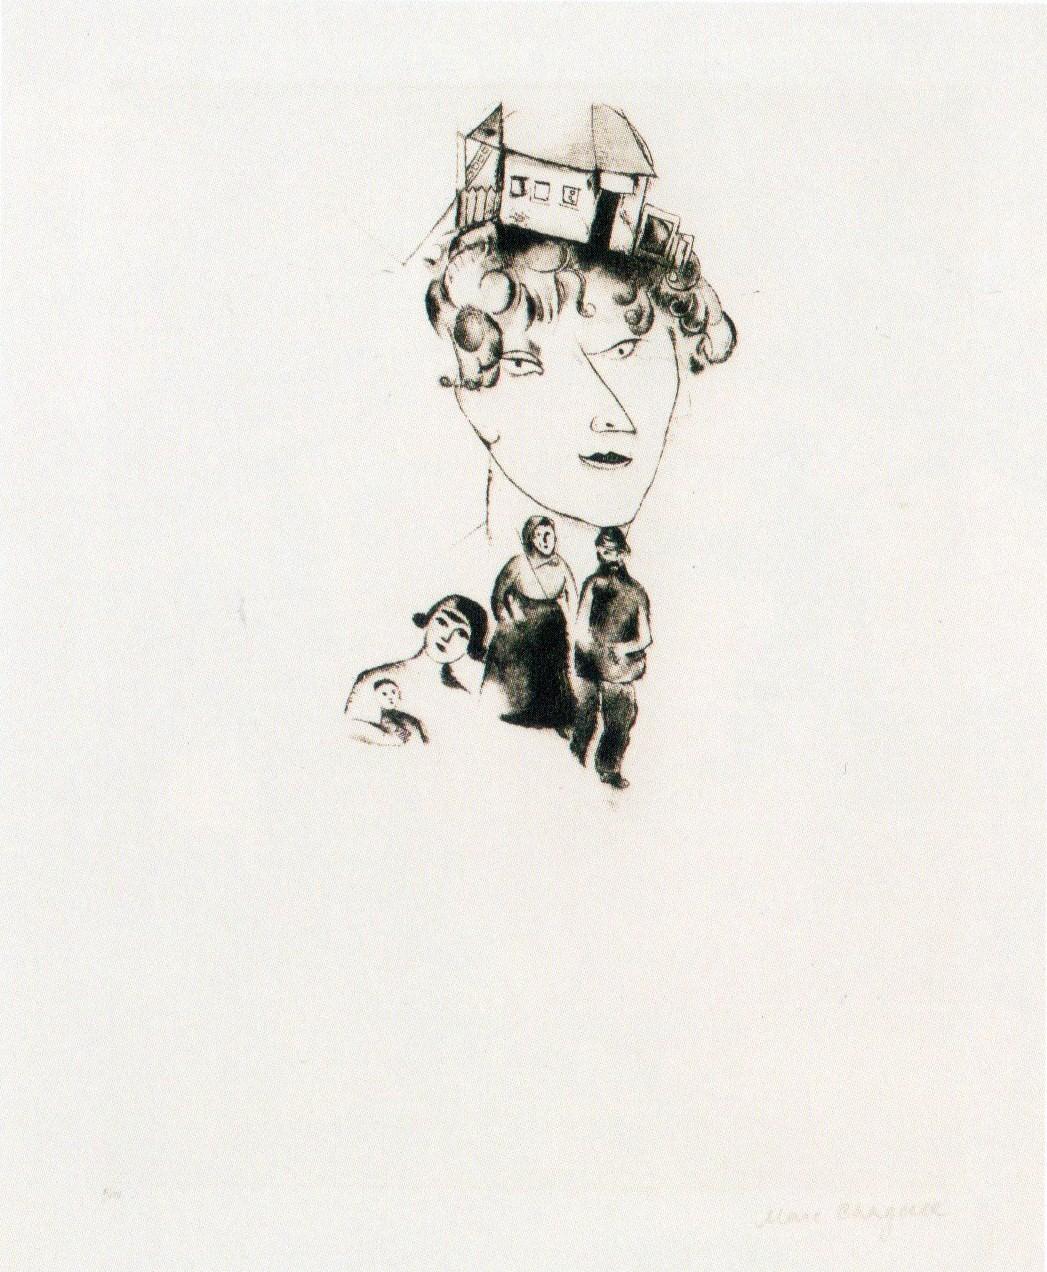 http://2.bp.blogspot.com/_IESYxYR0tmI/TLZucdZAP9I/AAAAAAAAEOs/iD-xPdKJ-I4/s1600/Self-Portrait,1923,Eatchiing+and+dry+point+on+paper.jpg